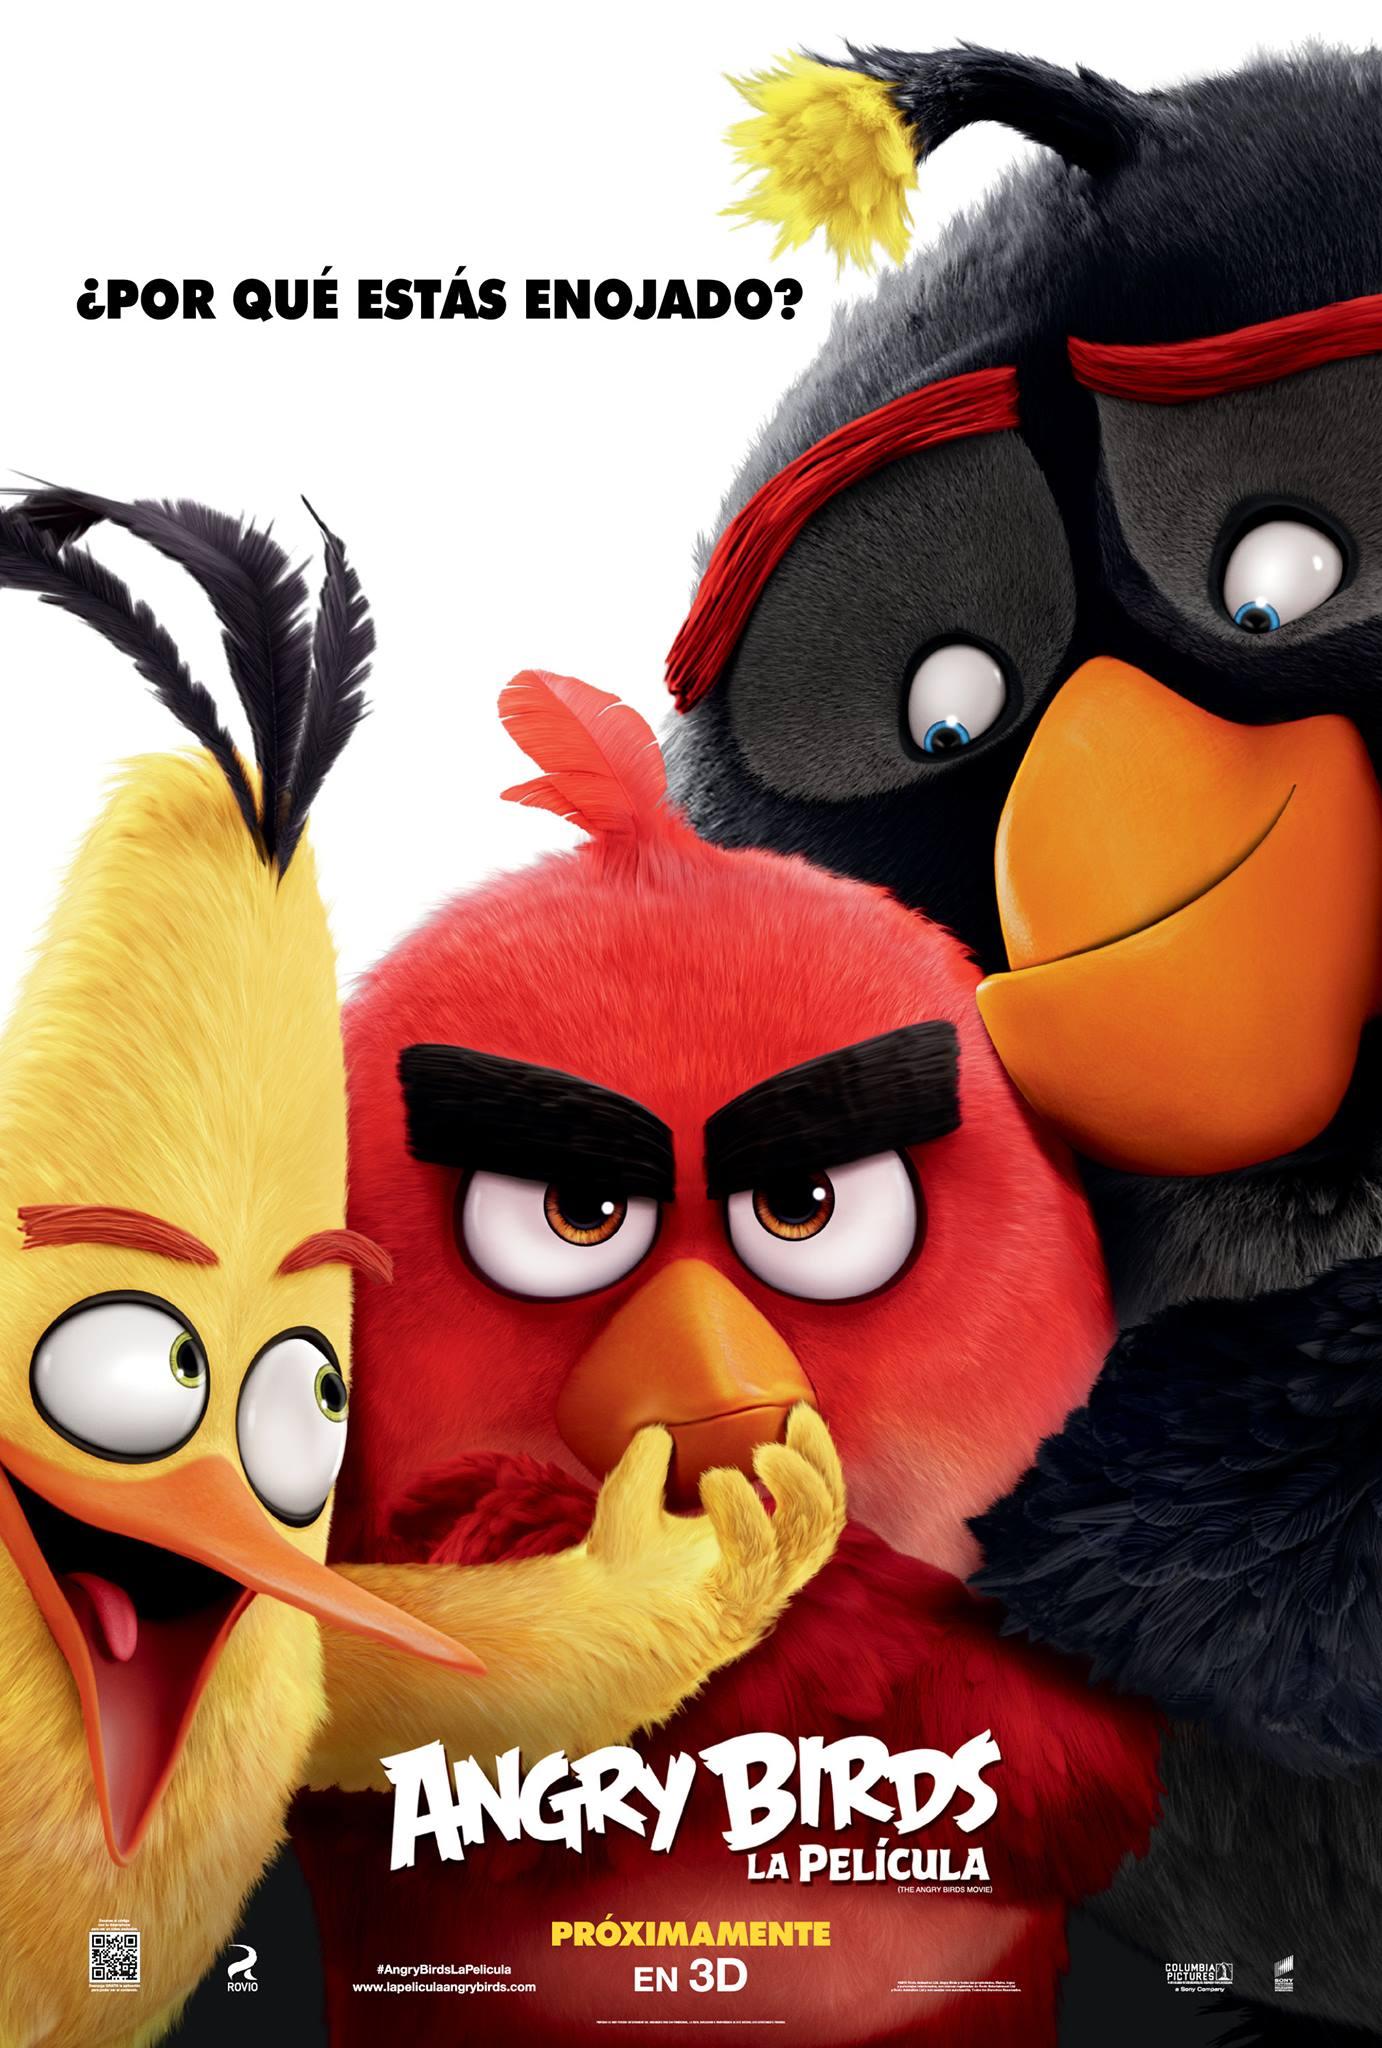 angry-birds-la-peliula-poster-latino-jposters_vfwe